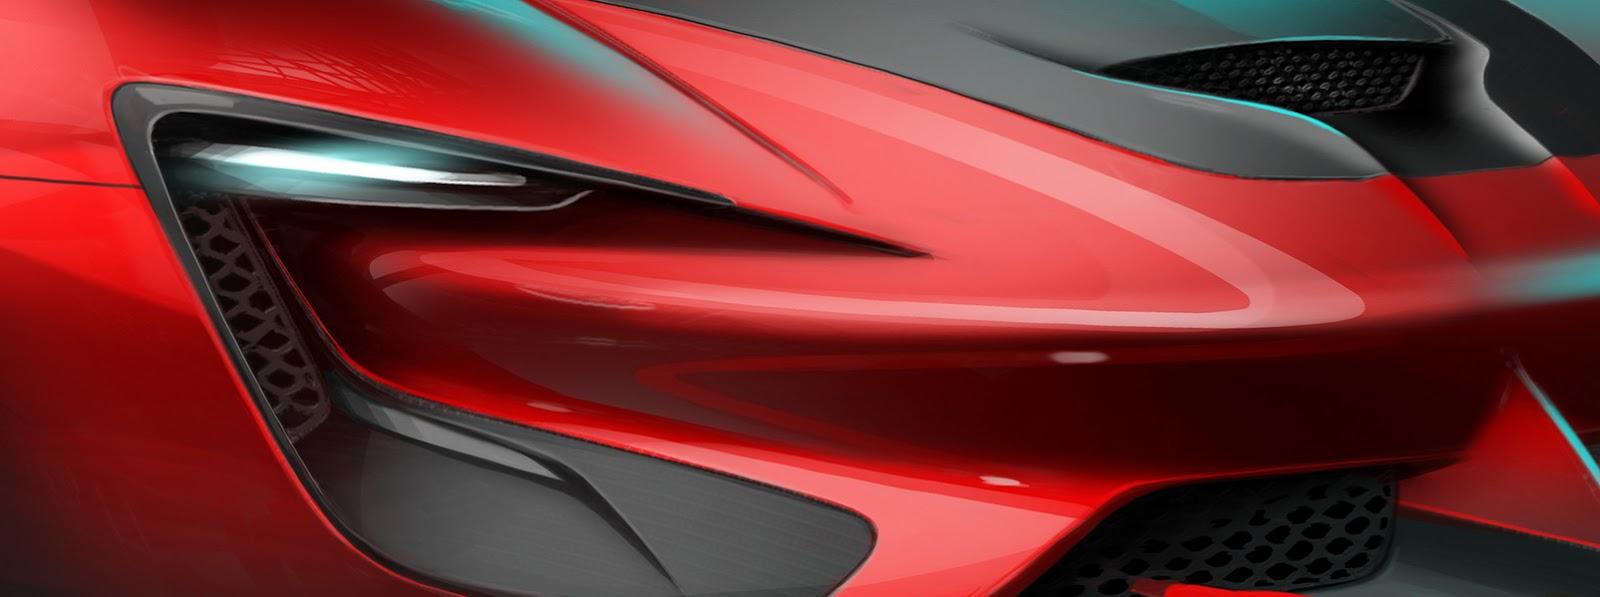 Chrysler S Srt Tomahawk Vision Gran Turismo W Video